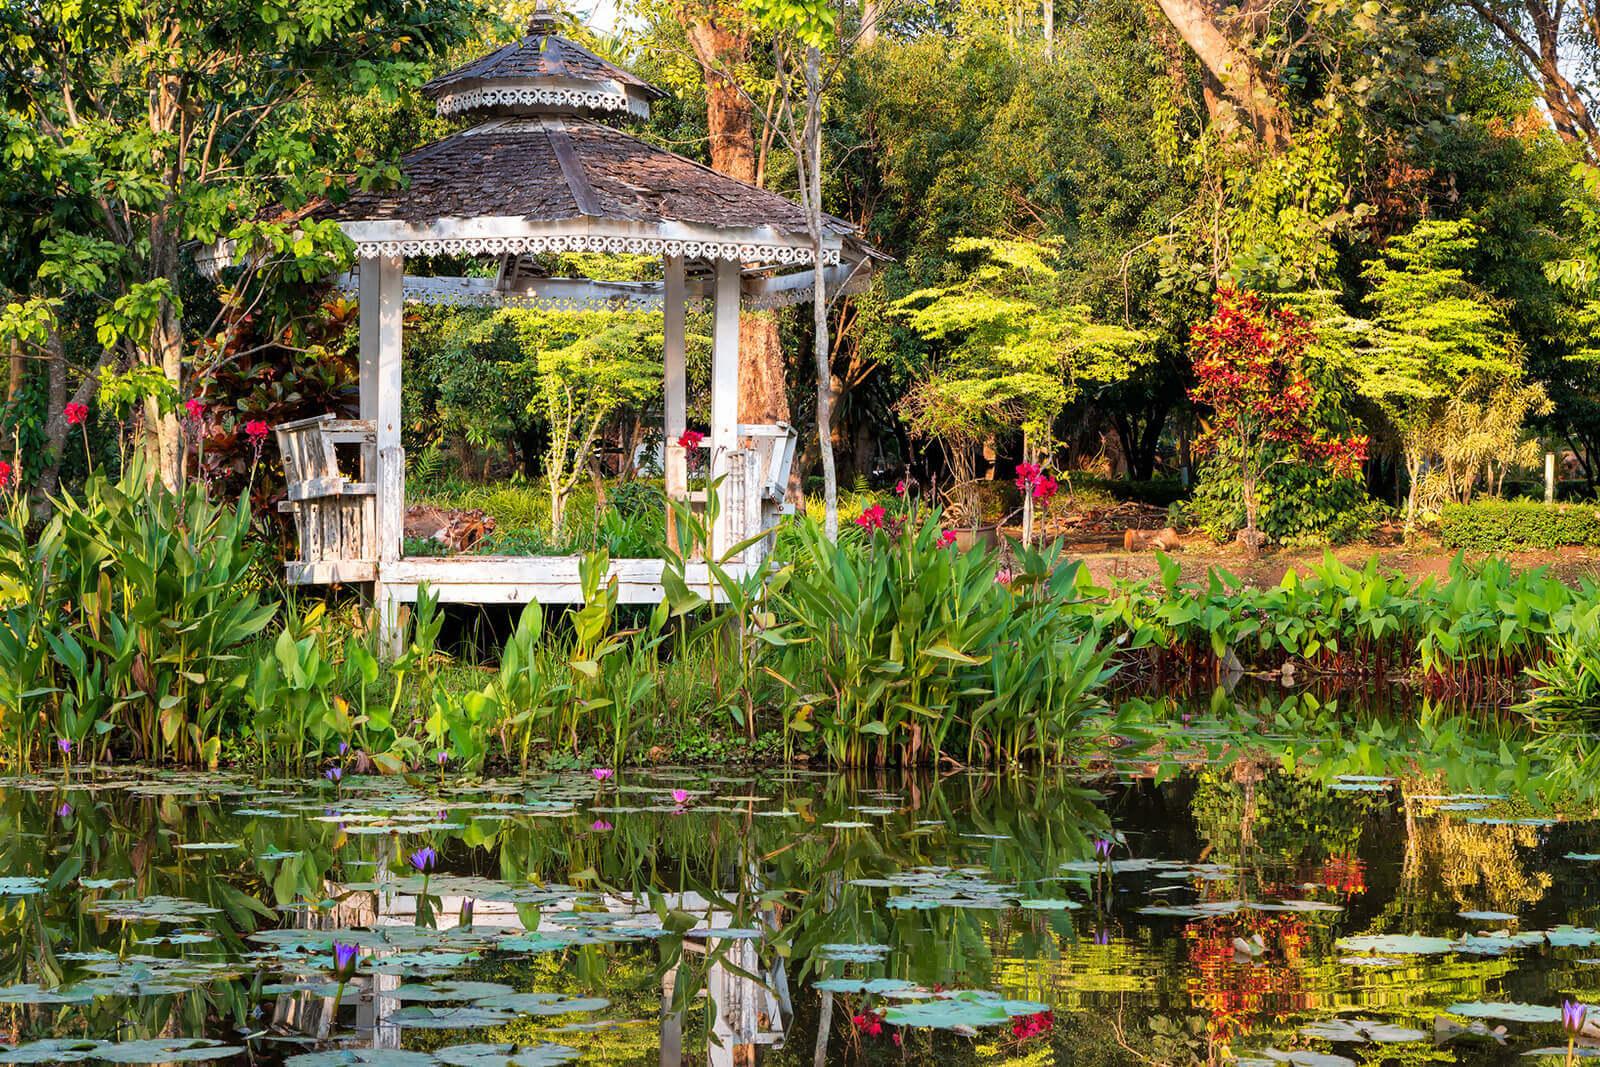 Pavillon-Gartenteich-ruine-zerfallen-romantisch